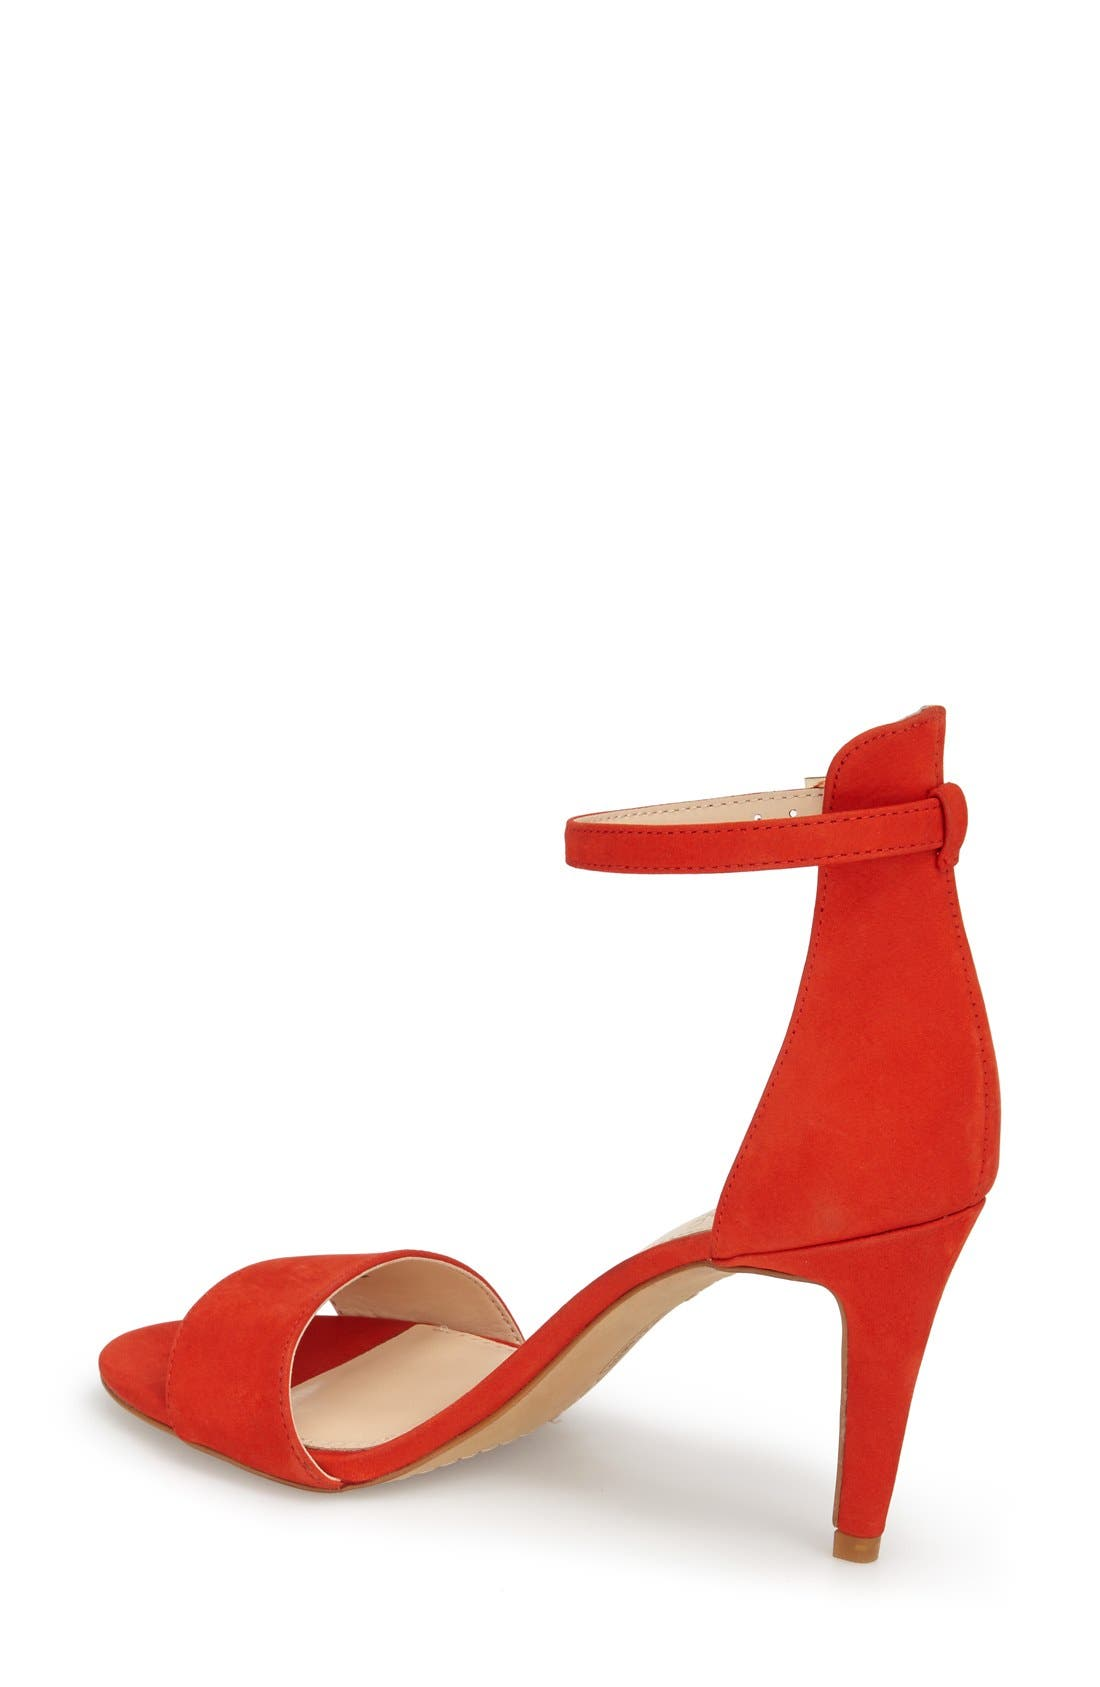 ,                             'Court' Ankle Strap Sandal,                             Alternate thumbnail 85, color,                             610